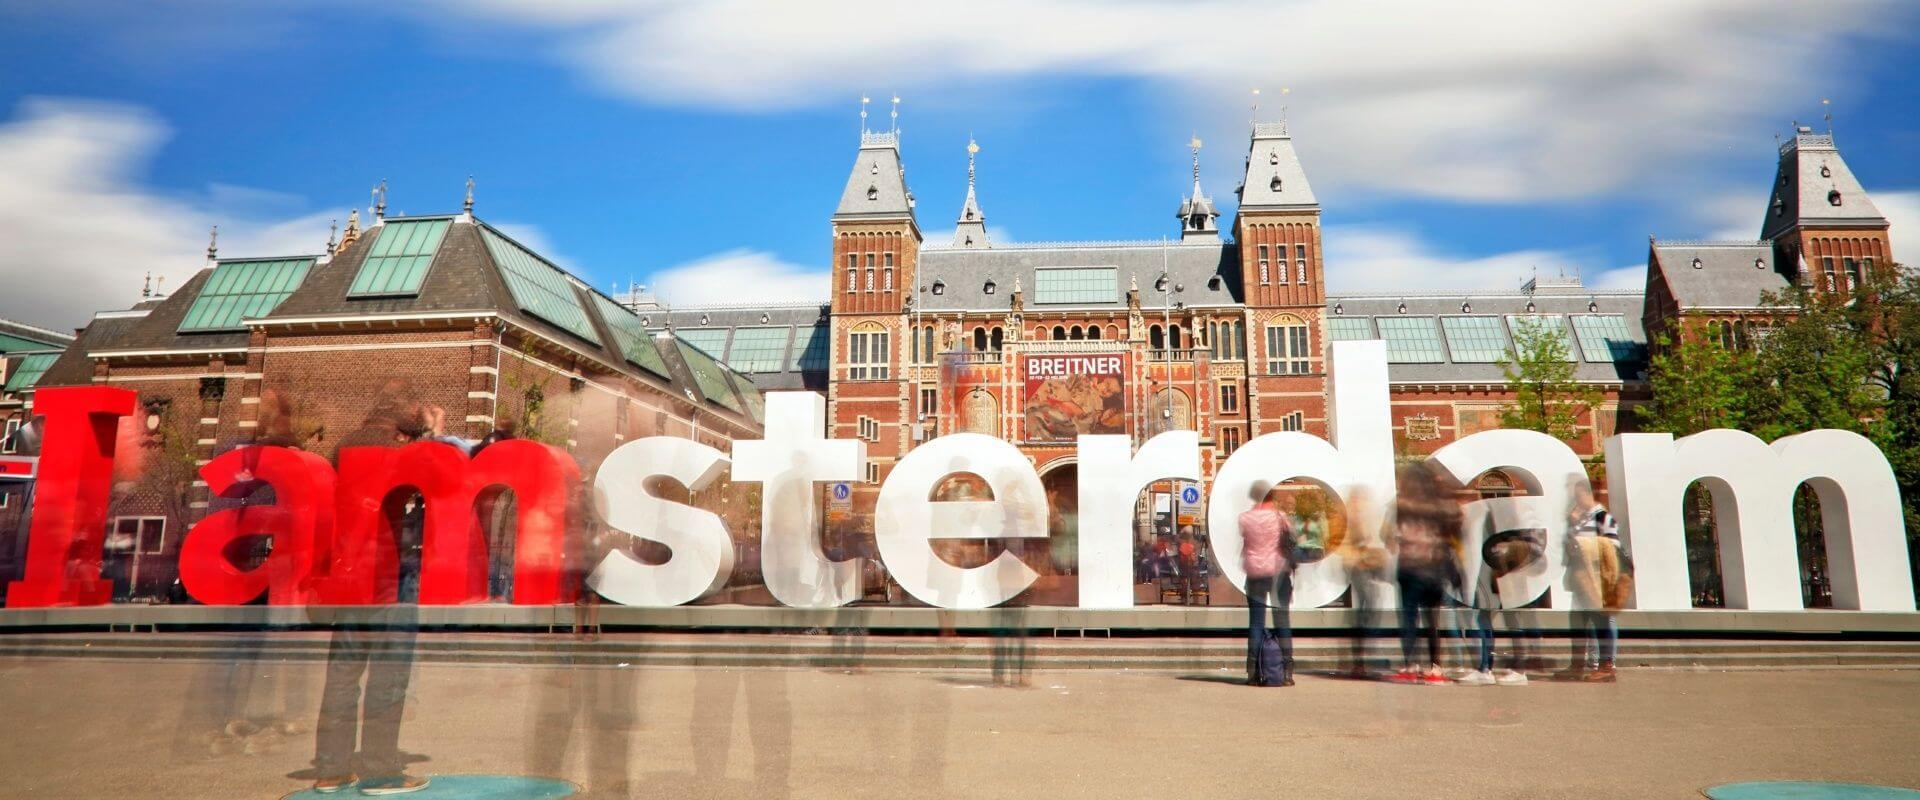 city-portraits-smart-city-amsterdam.jpg